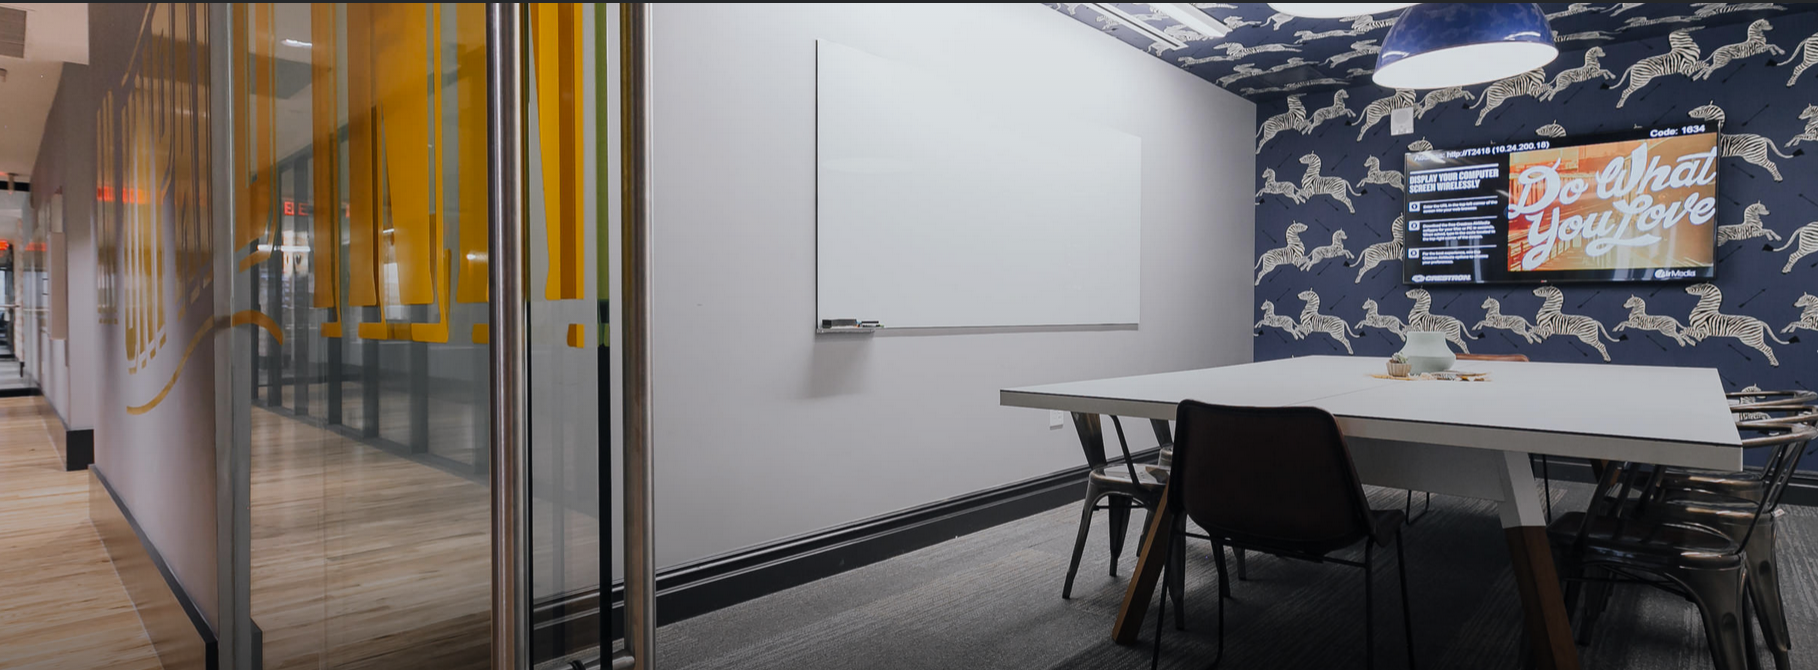 Wework Shoreditch - meeting room